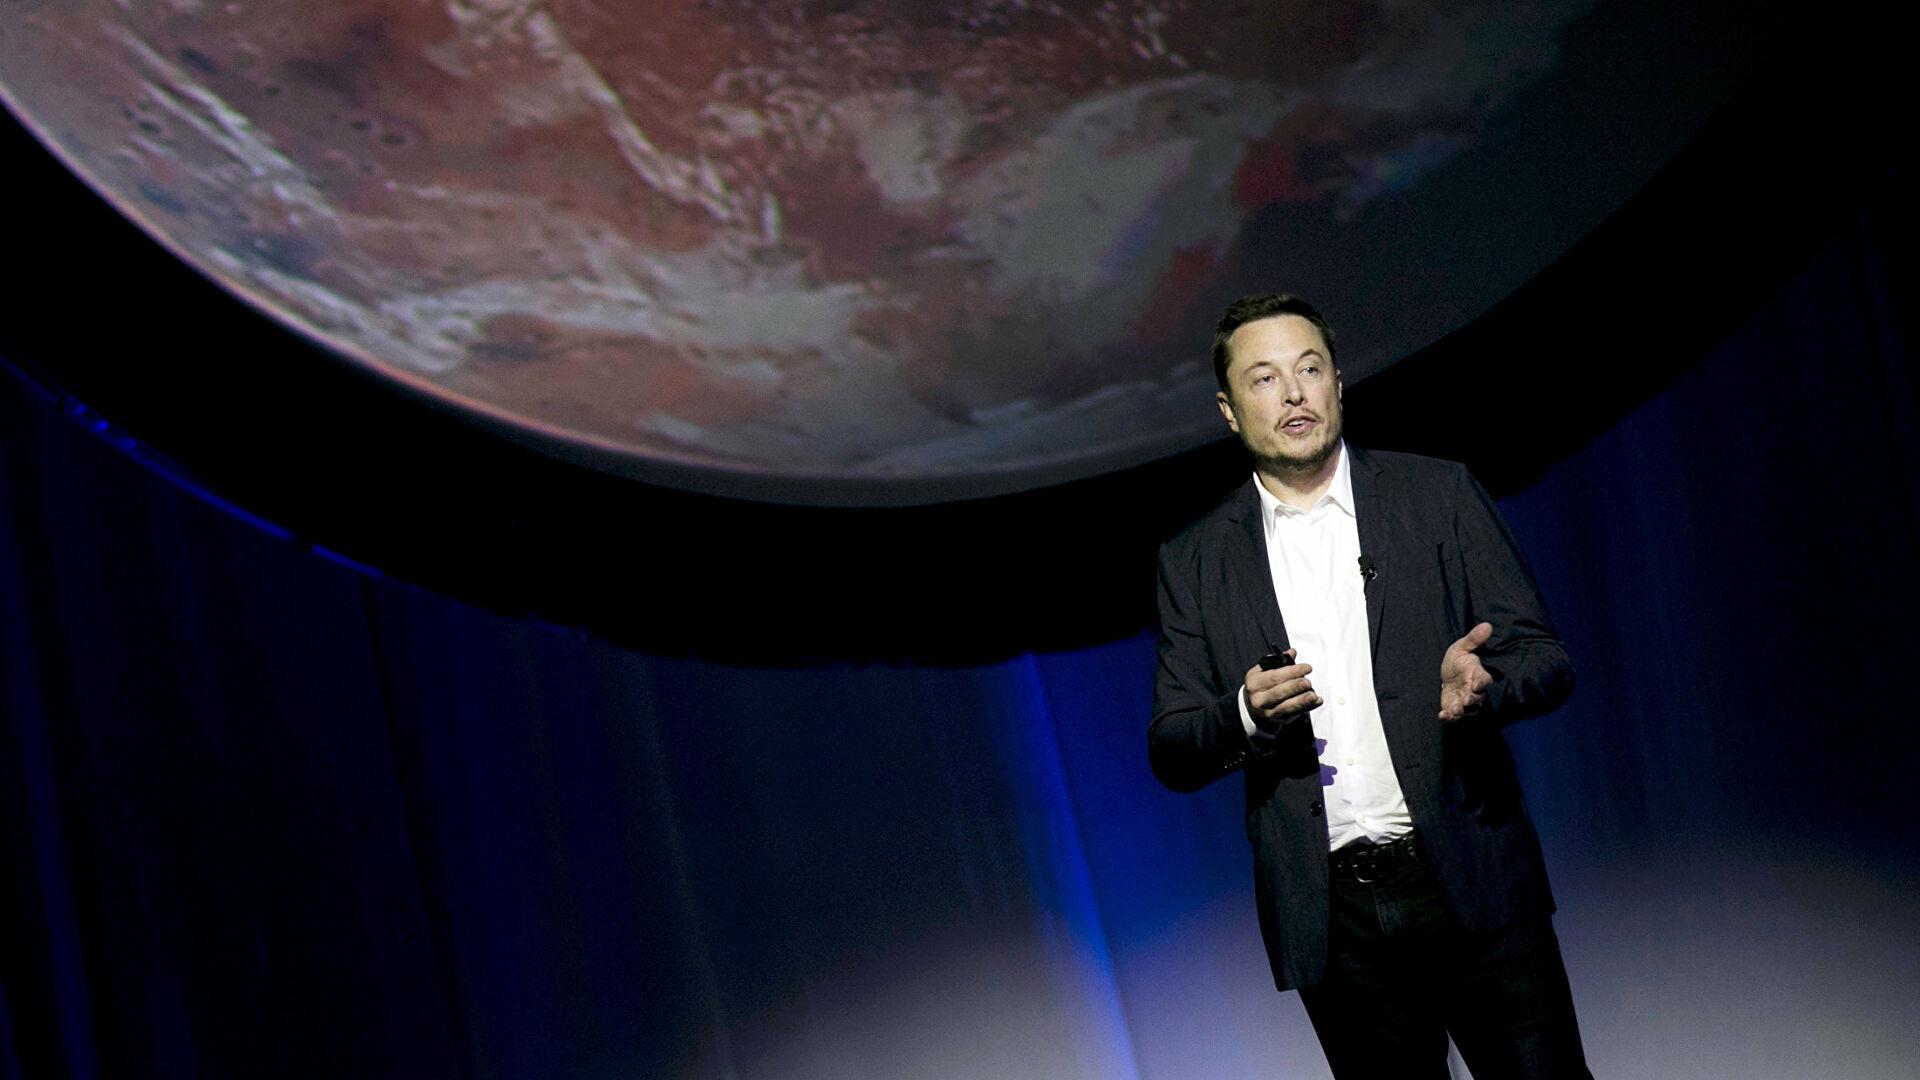 Индекс миллиардеров Bloomberg: Илон Маск – самый богатый на планете